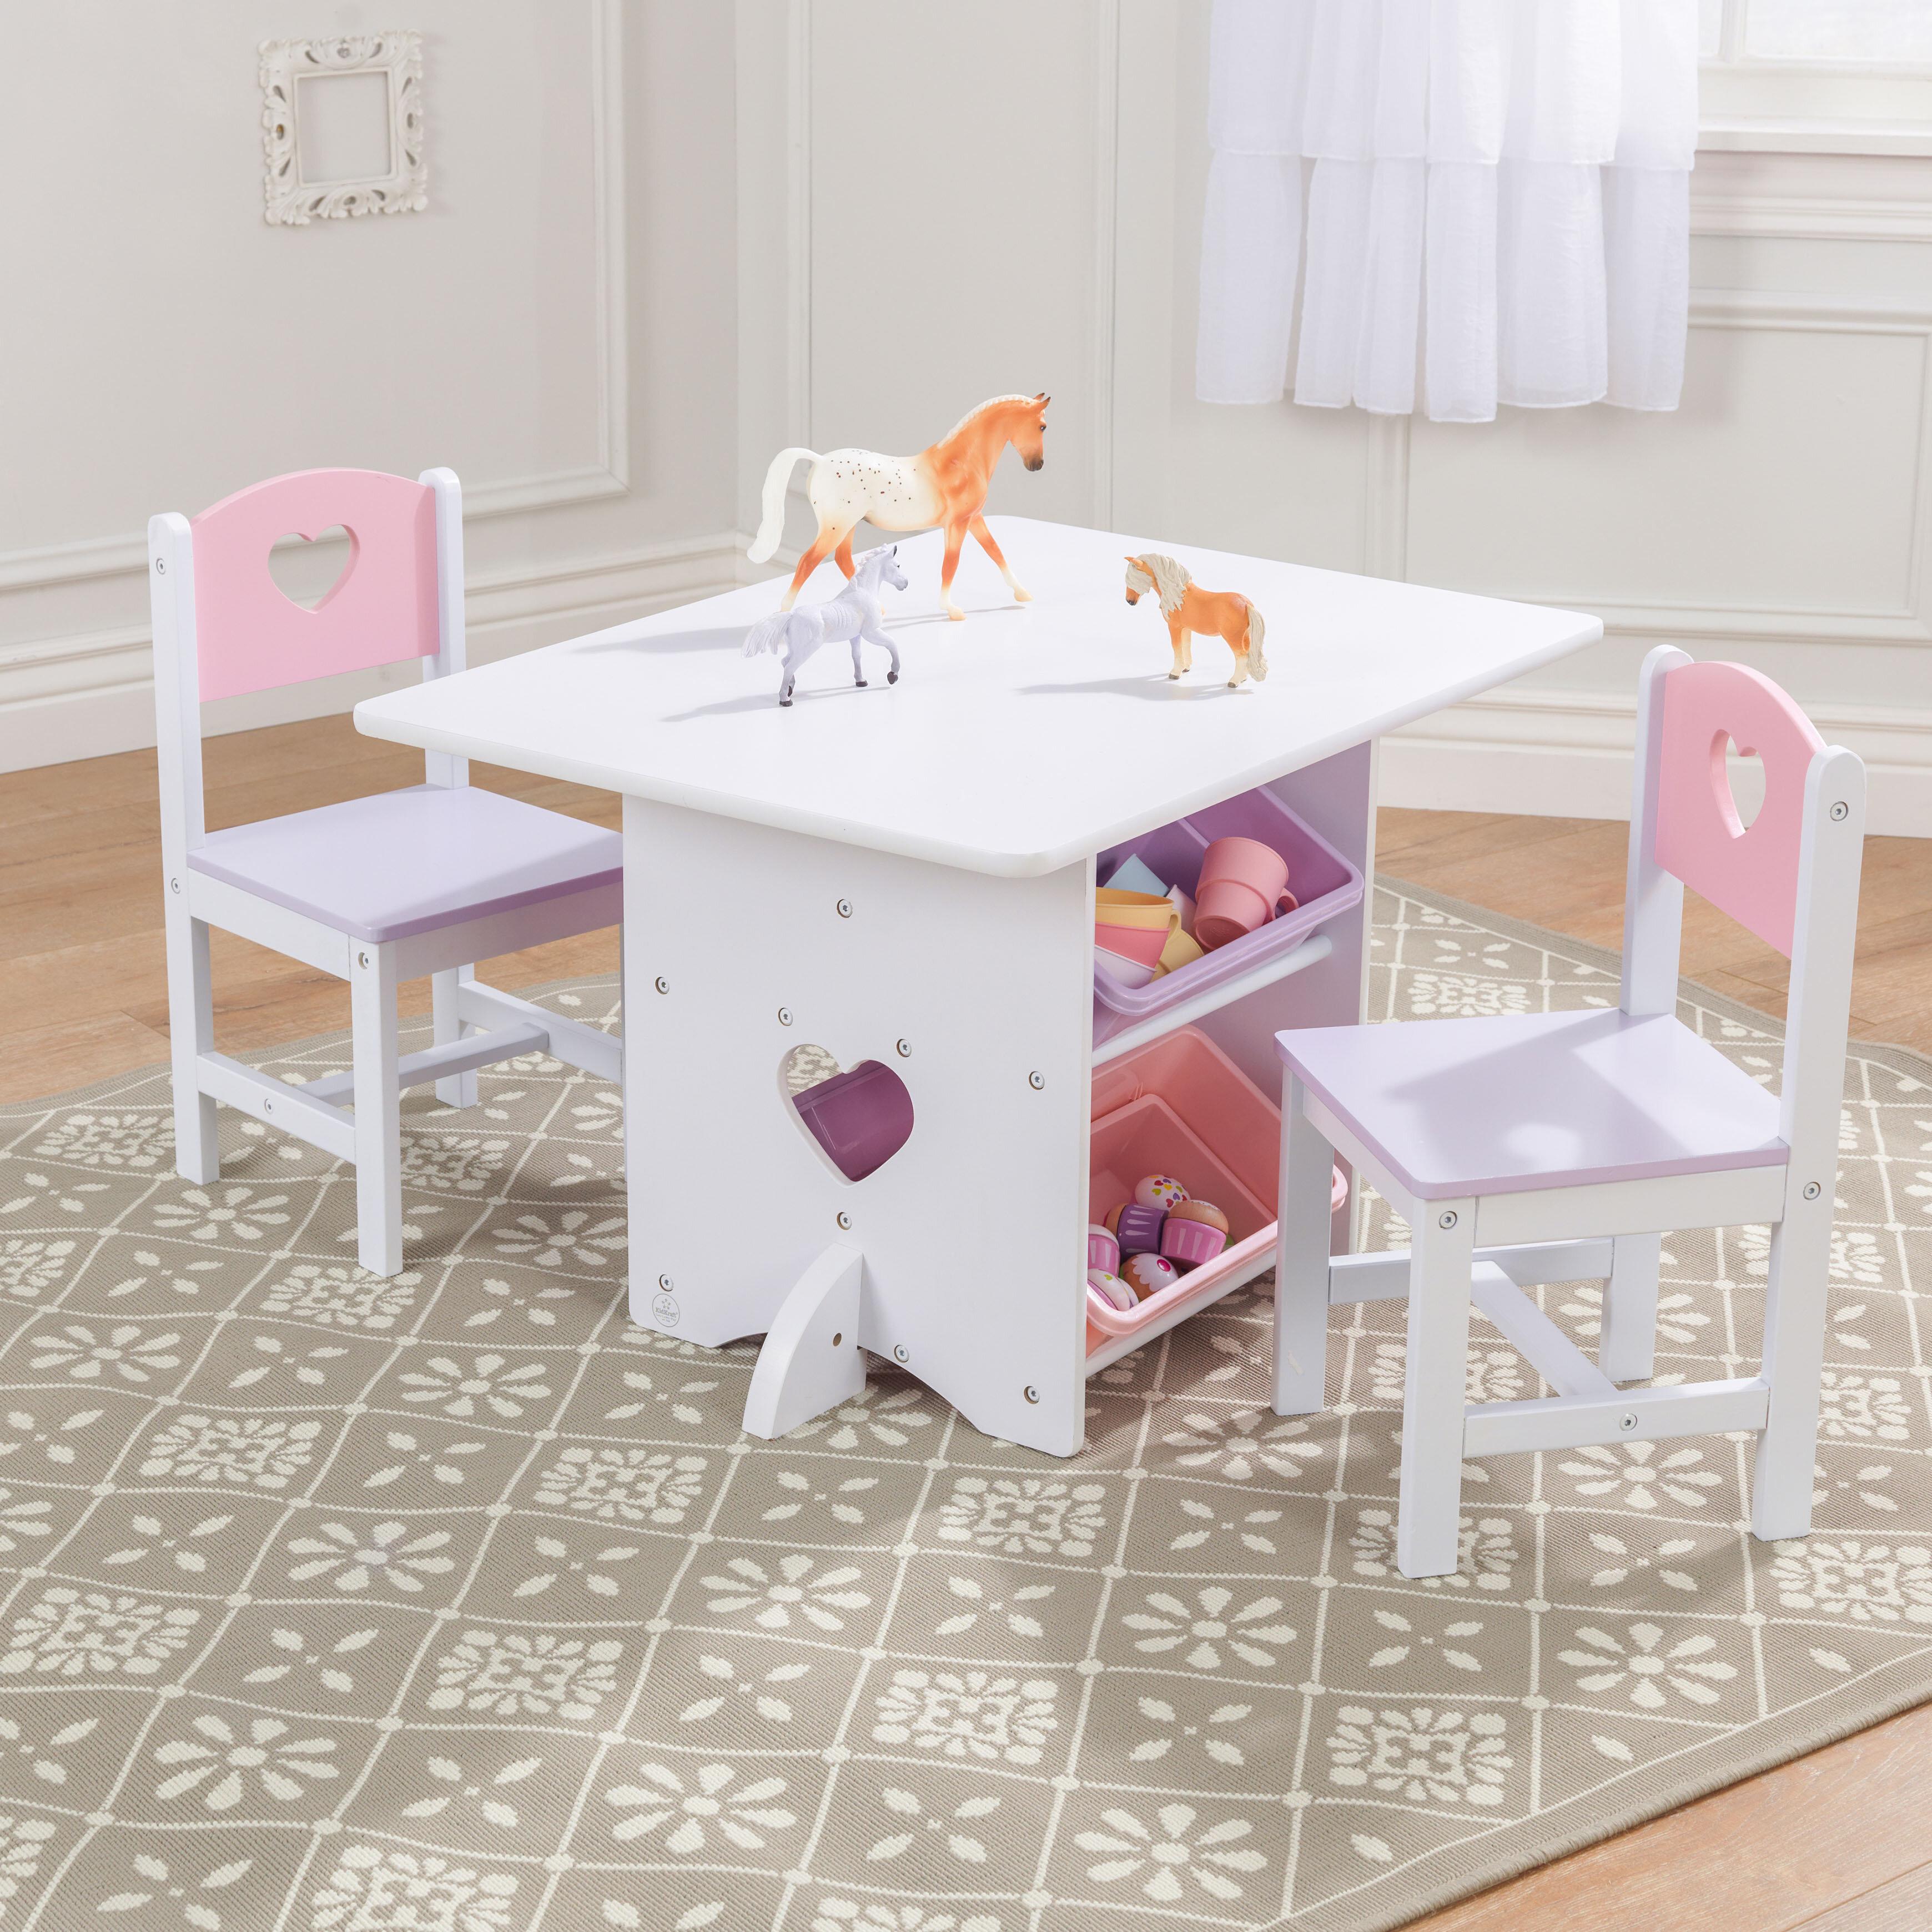 Sensational Heart Kids 7 Piece Table Chair Set Cjindustries Chair Design For Home Cjindustriesco